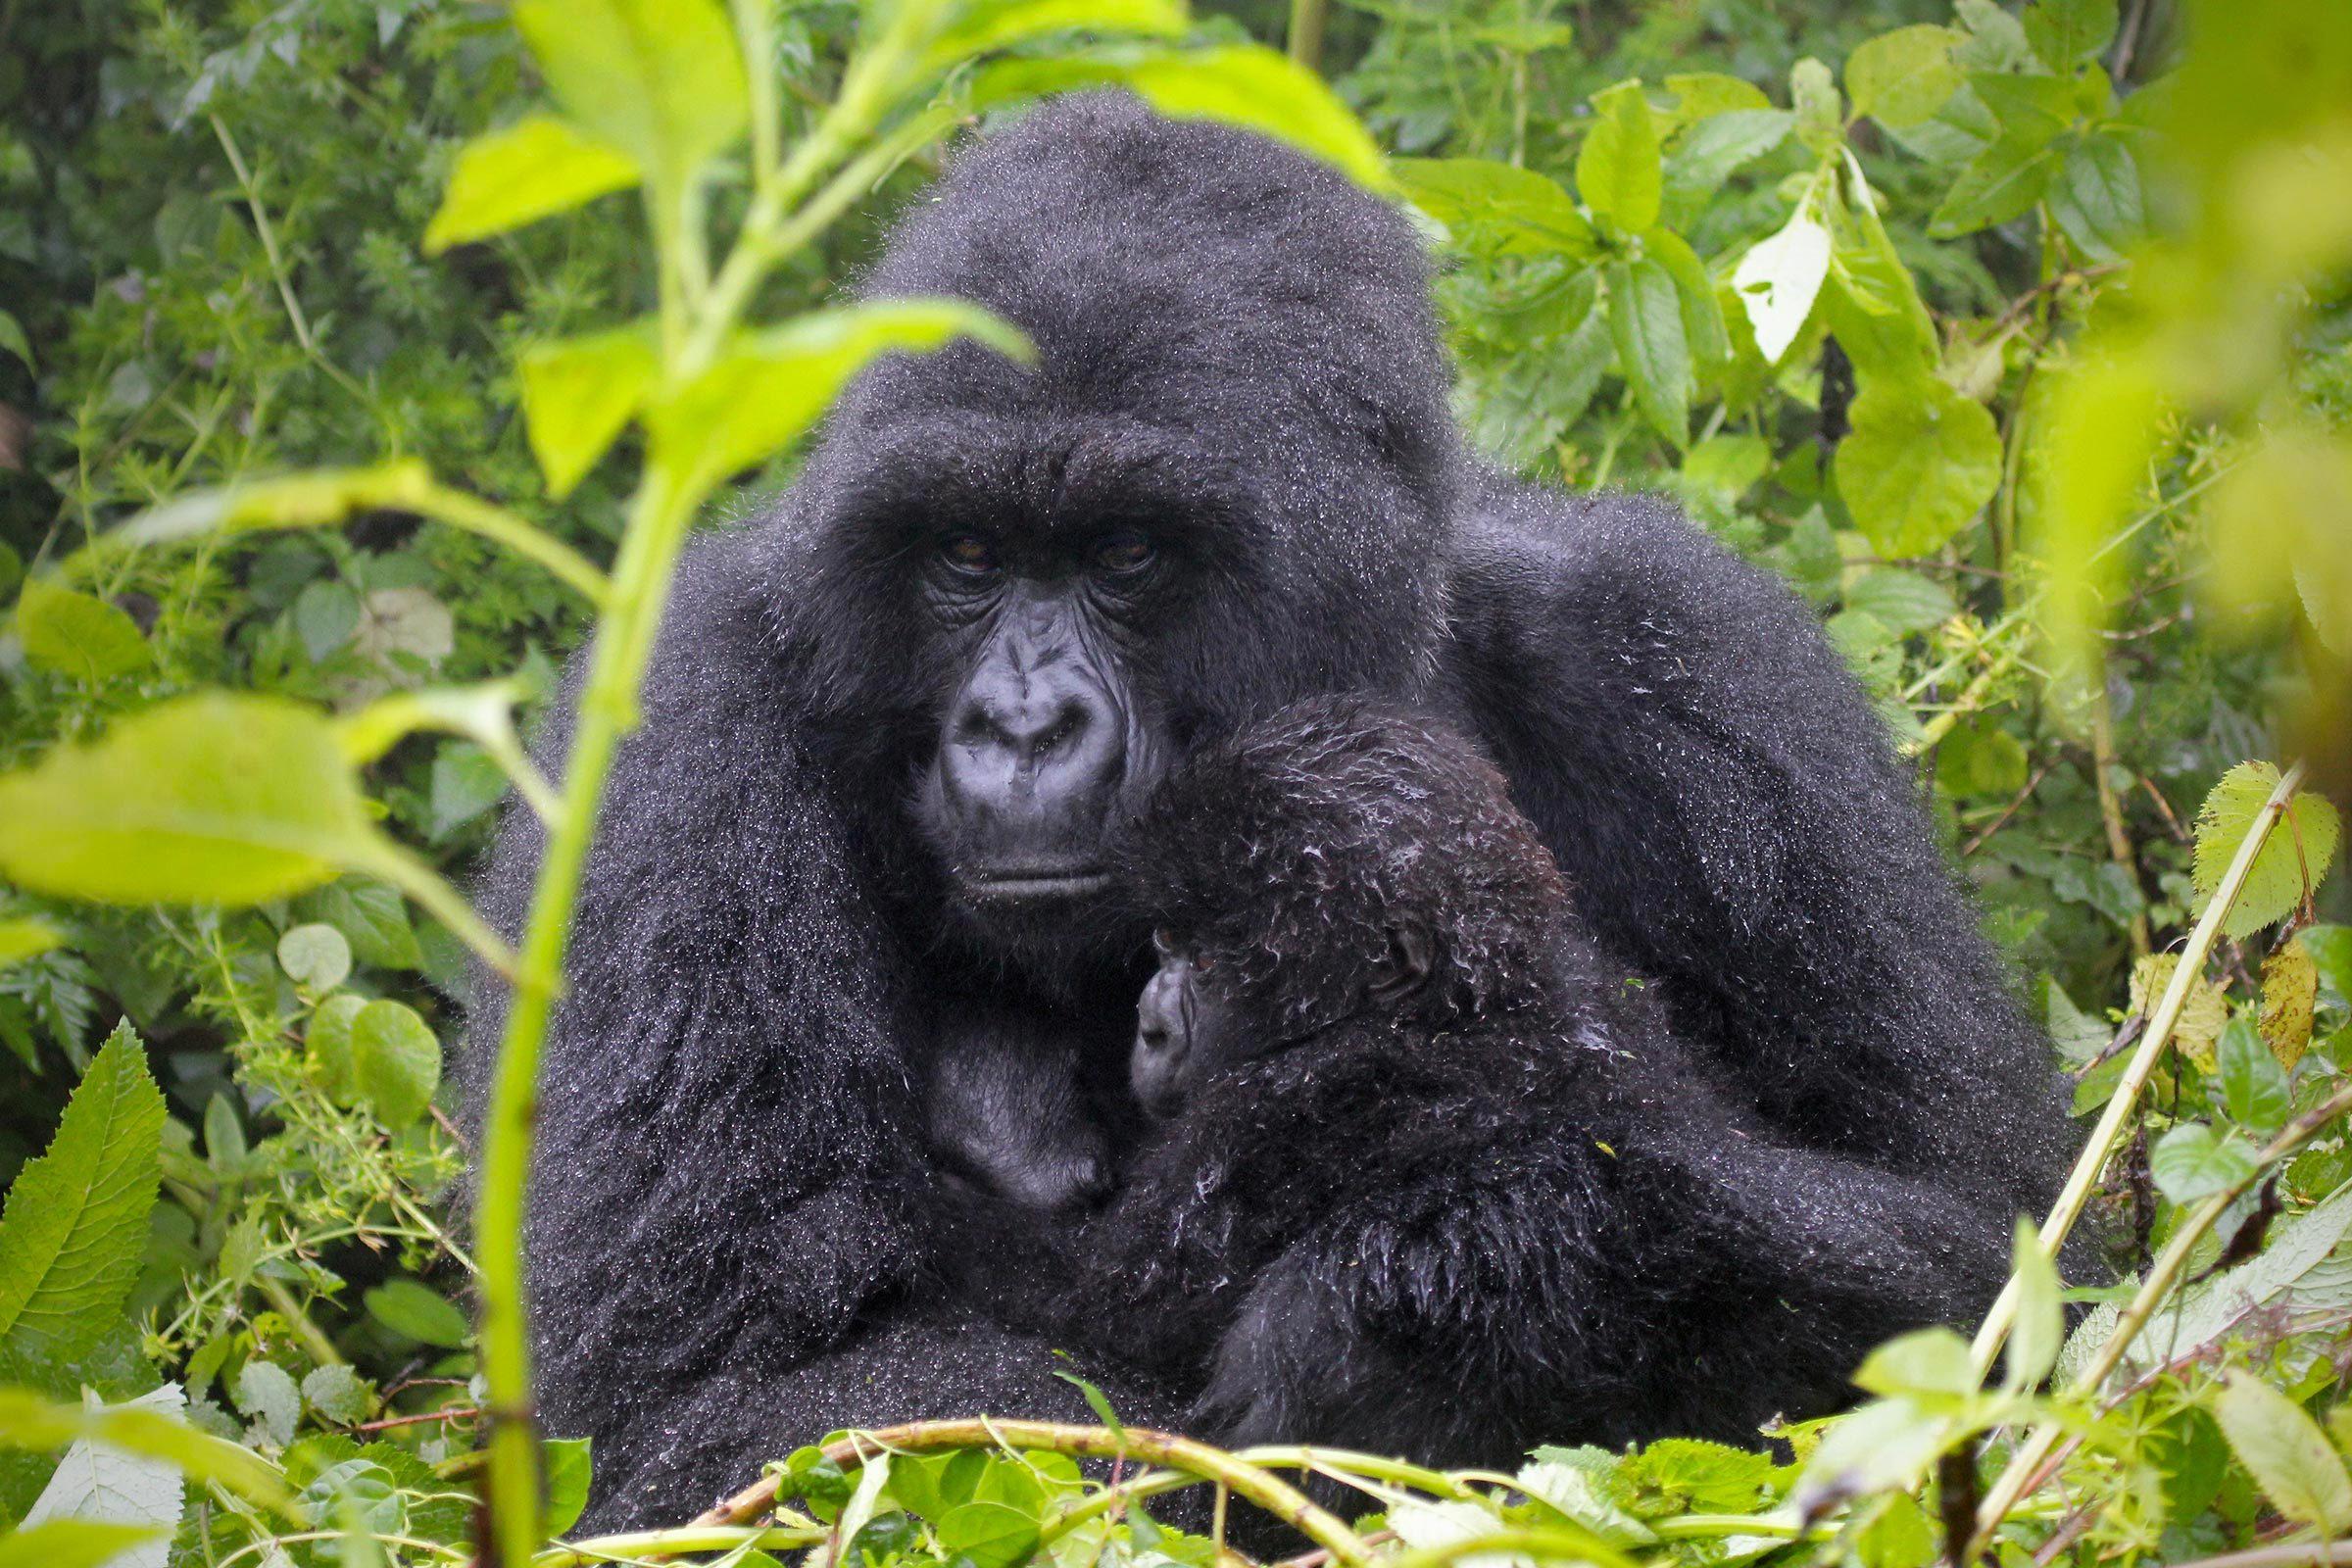 Espèces menacées : gorille de montagne (Gorilla beringei beringei)